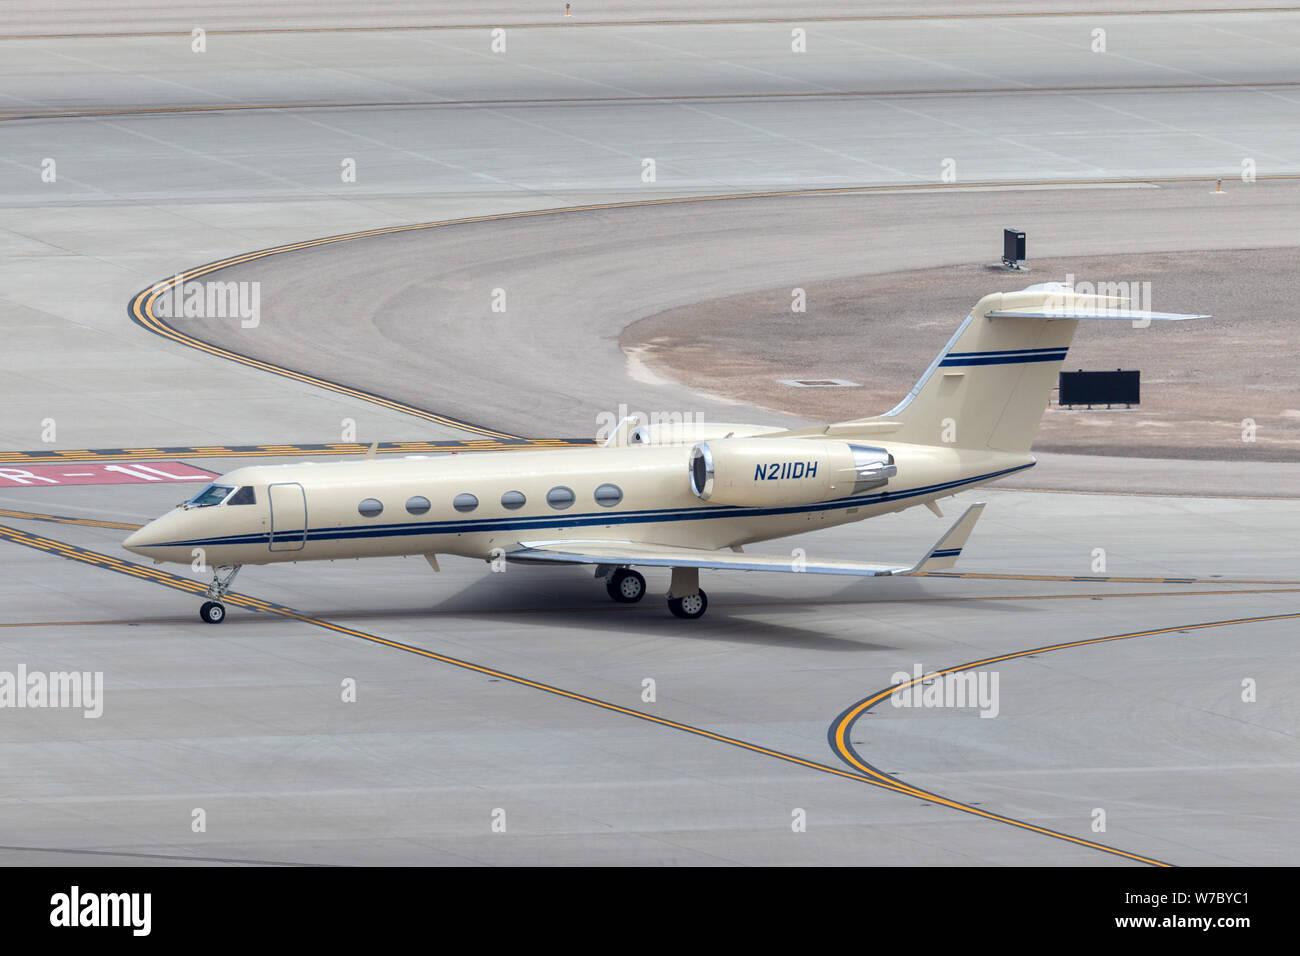 Gulfstream G-IV luxury business jet N211DH at McCarran International Airport Las Vegas. Stock Photo